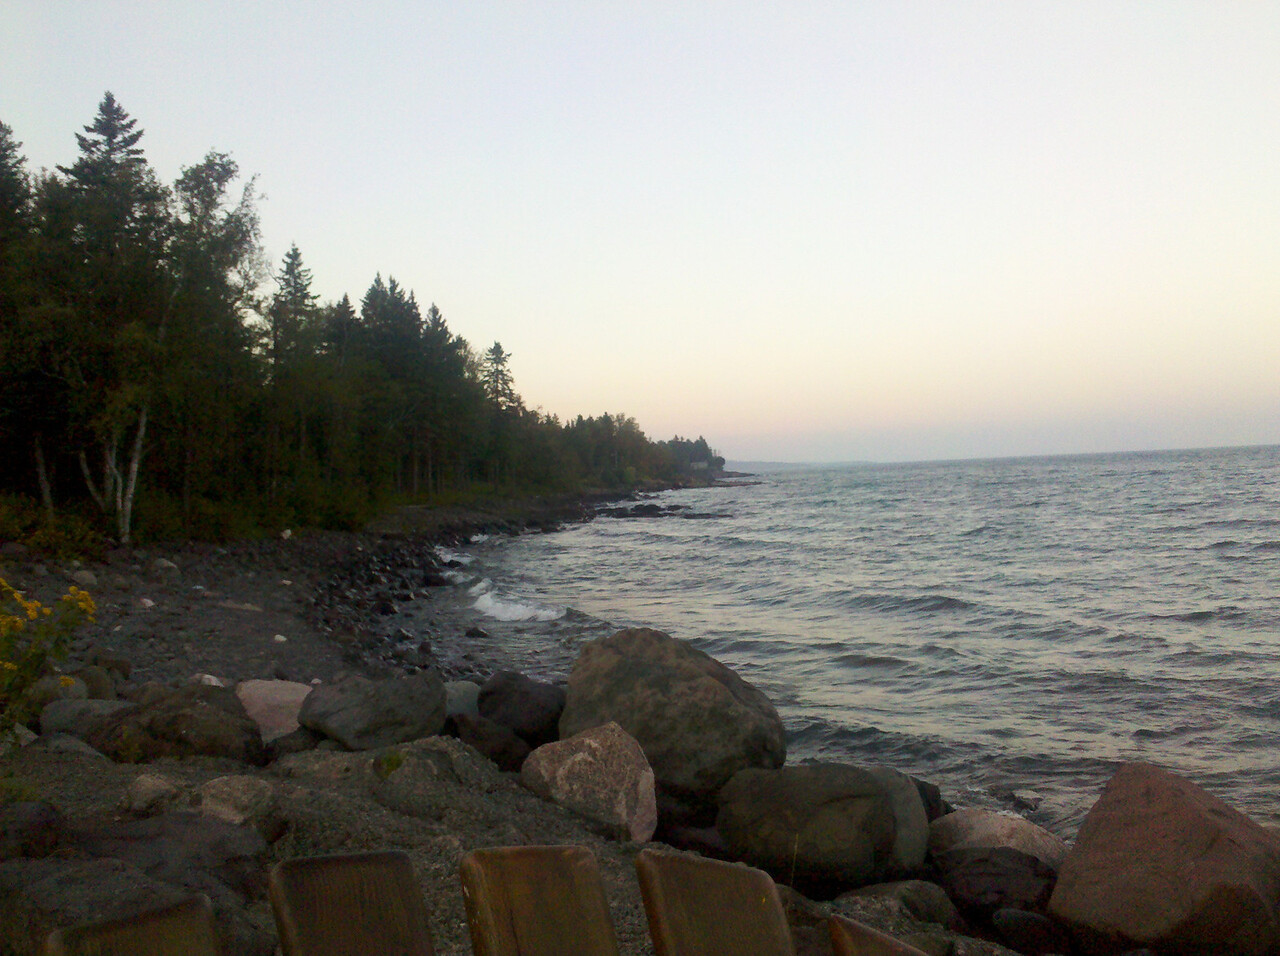 Lake Superior coast north of Larsmont